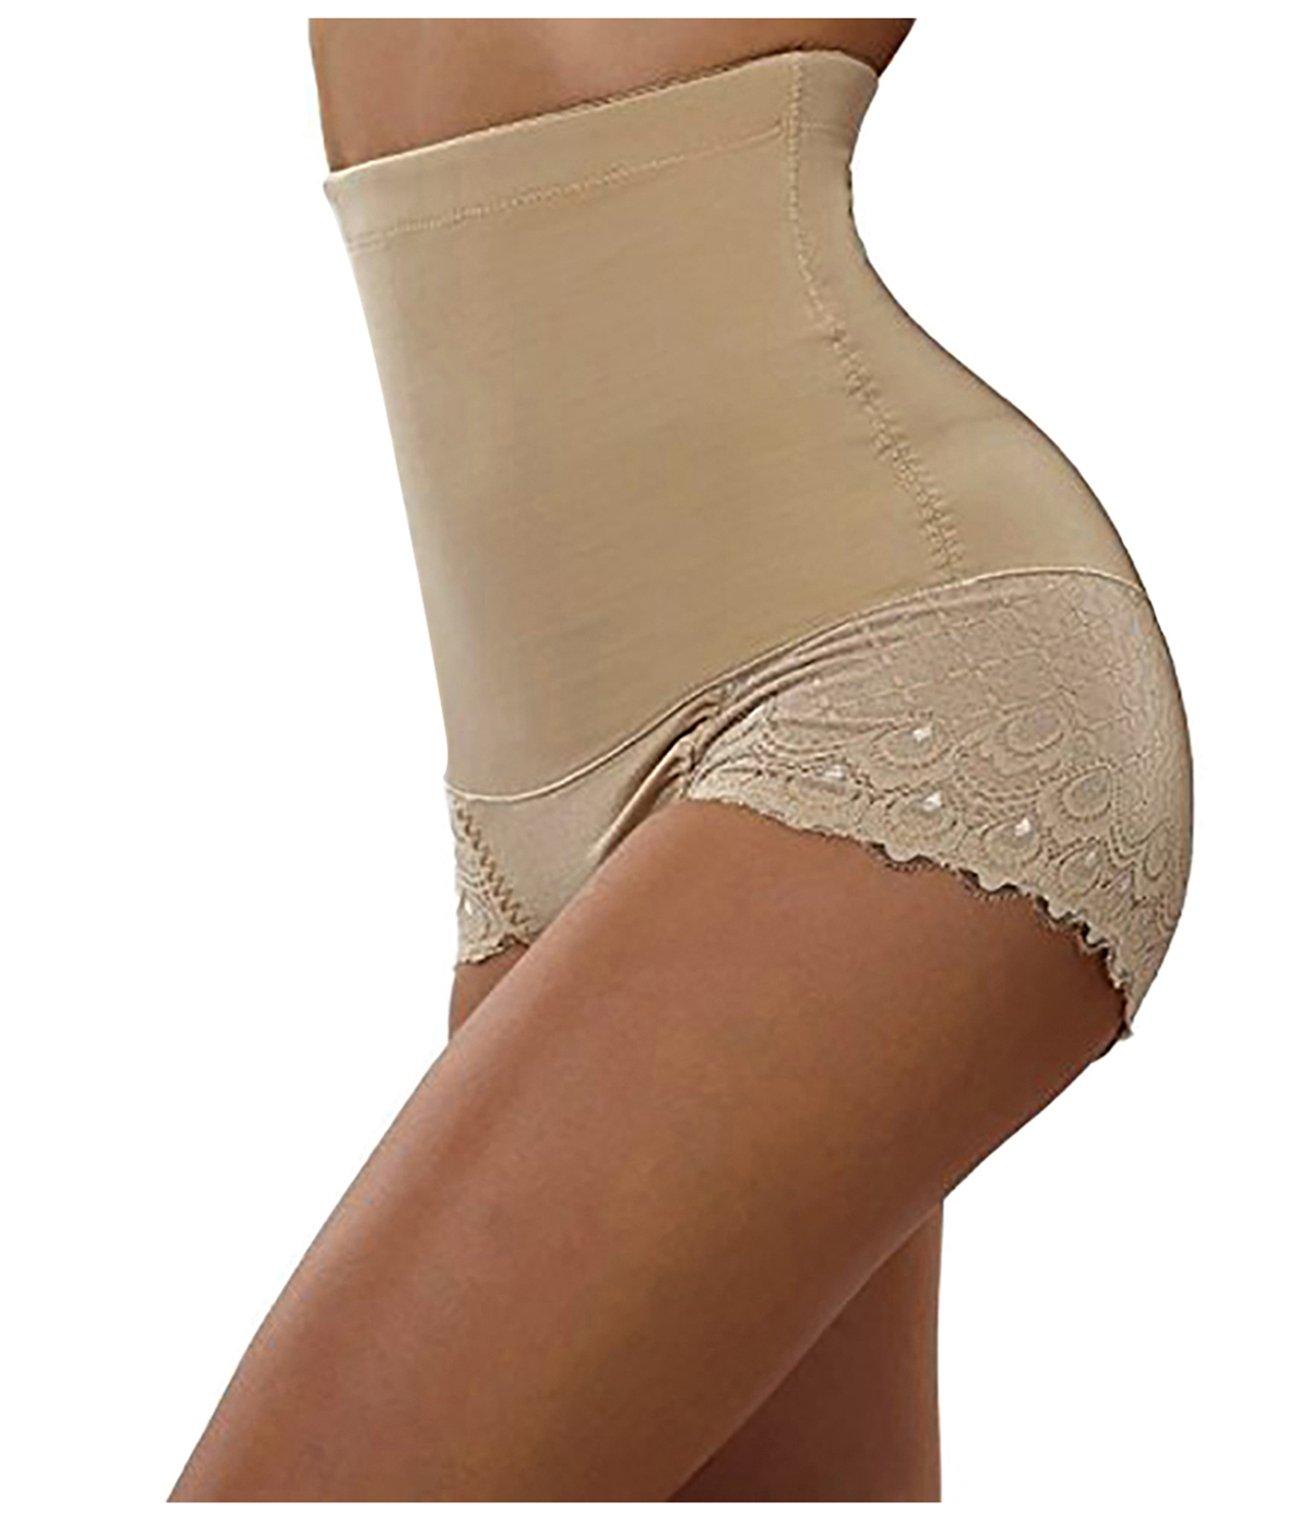 Nebility Women Butt Lifter Shapewear Seamless Waist Trainer Hi-Waist Tummy Control Body Shaper Panty (M, Beige)